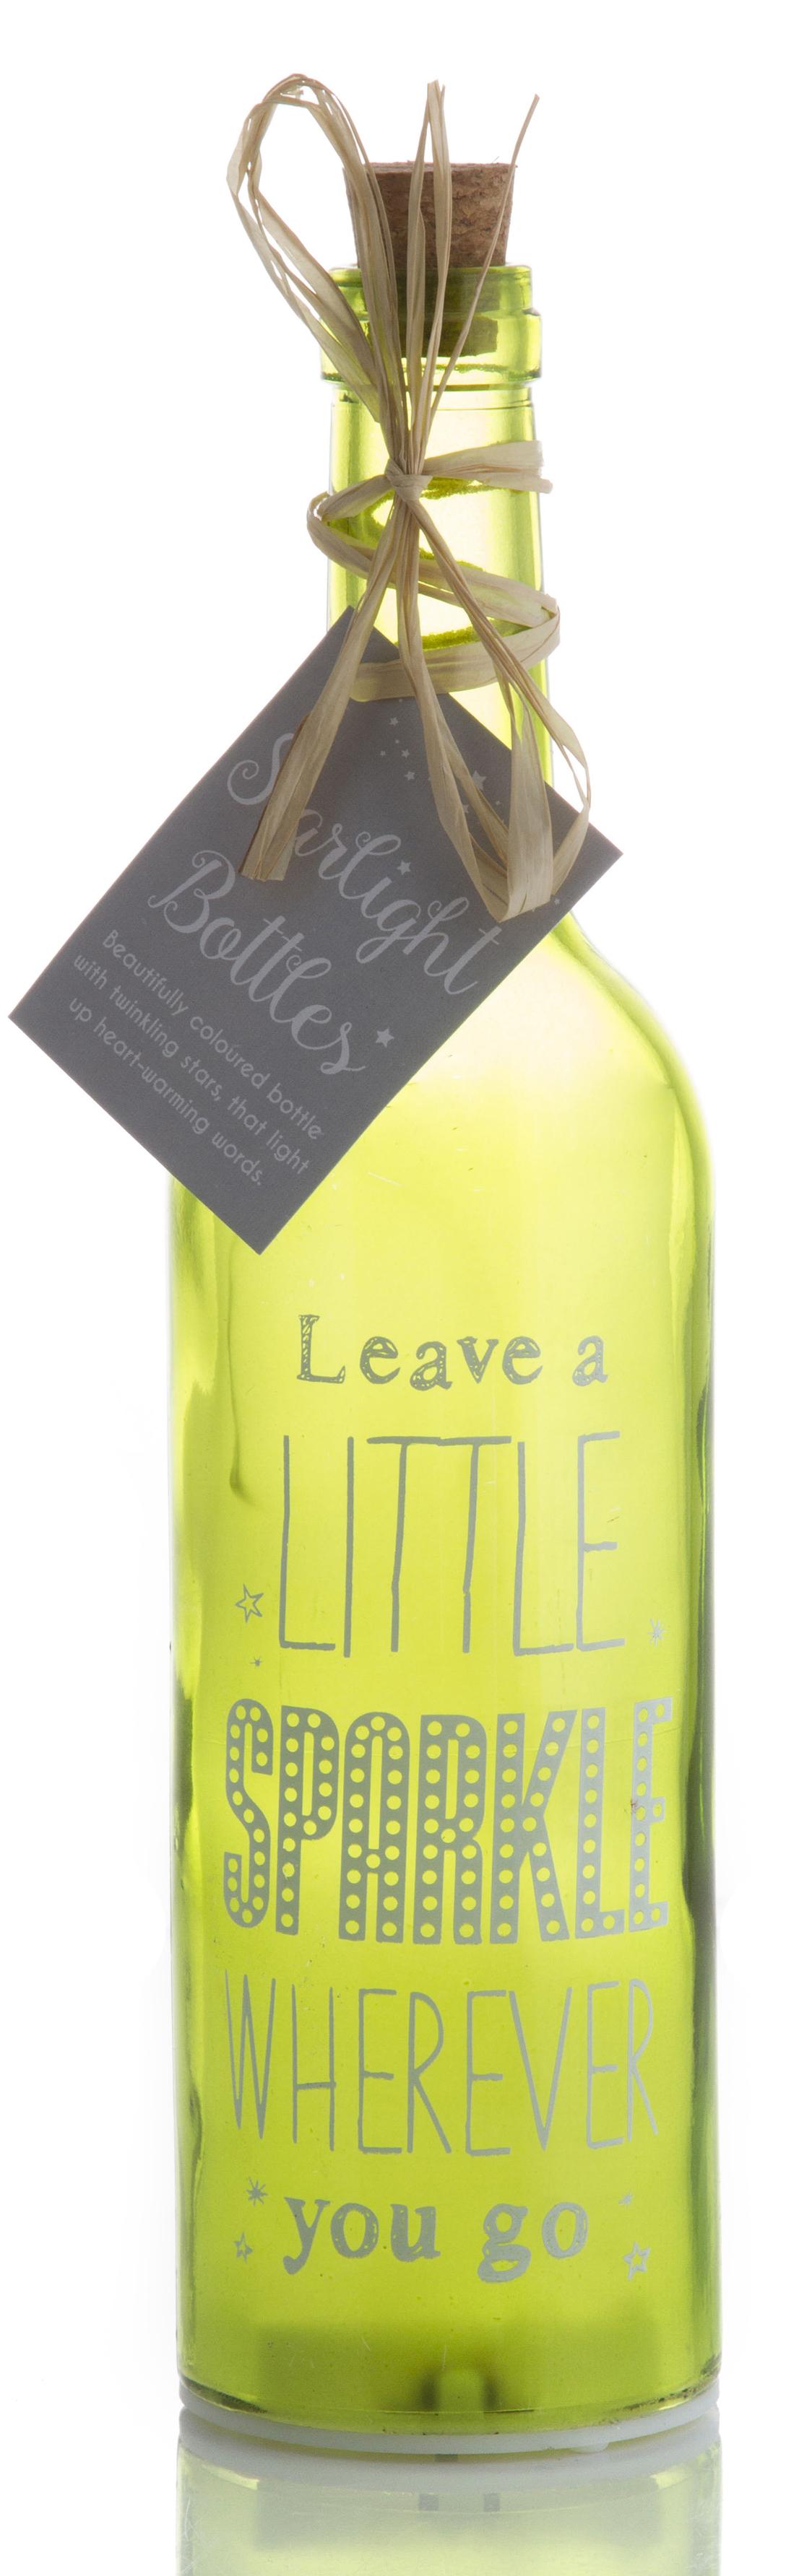 Leave A Little Sparkle Starlight Bottle